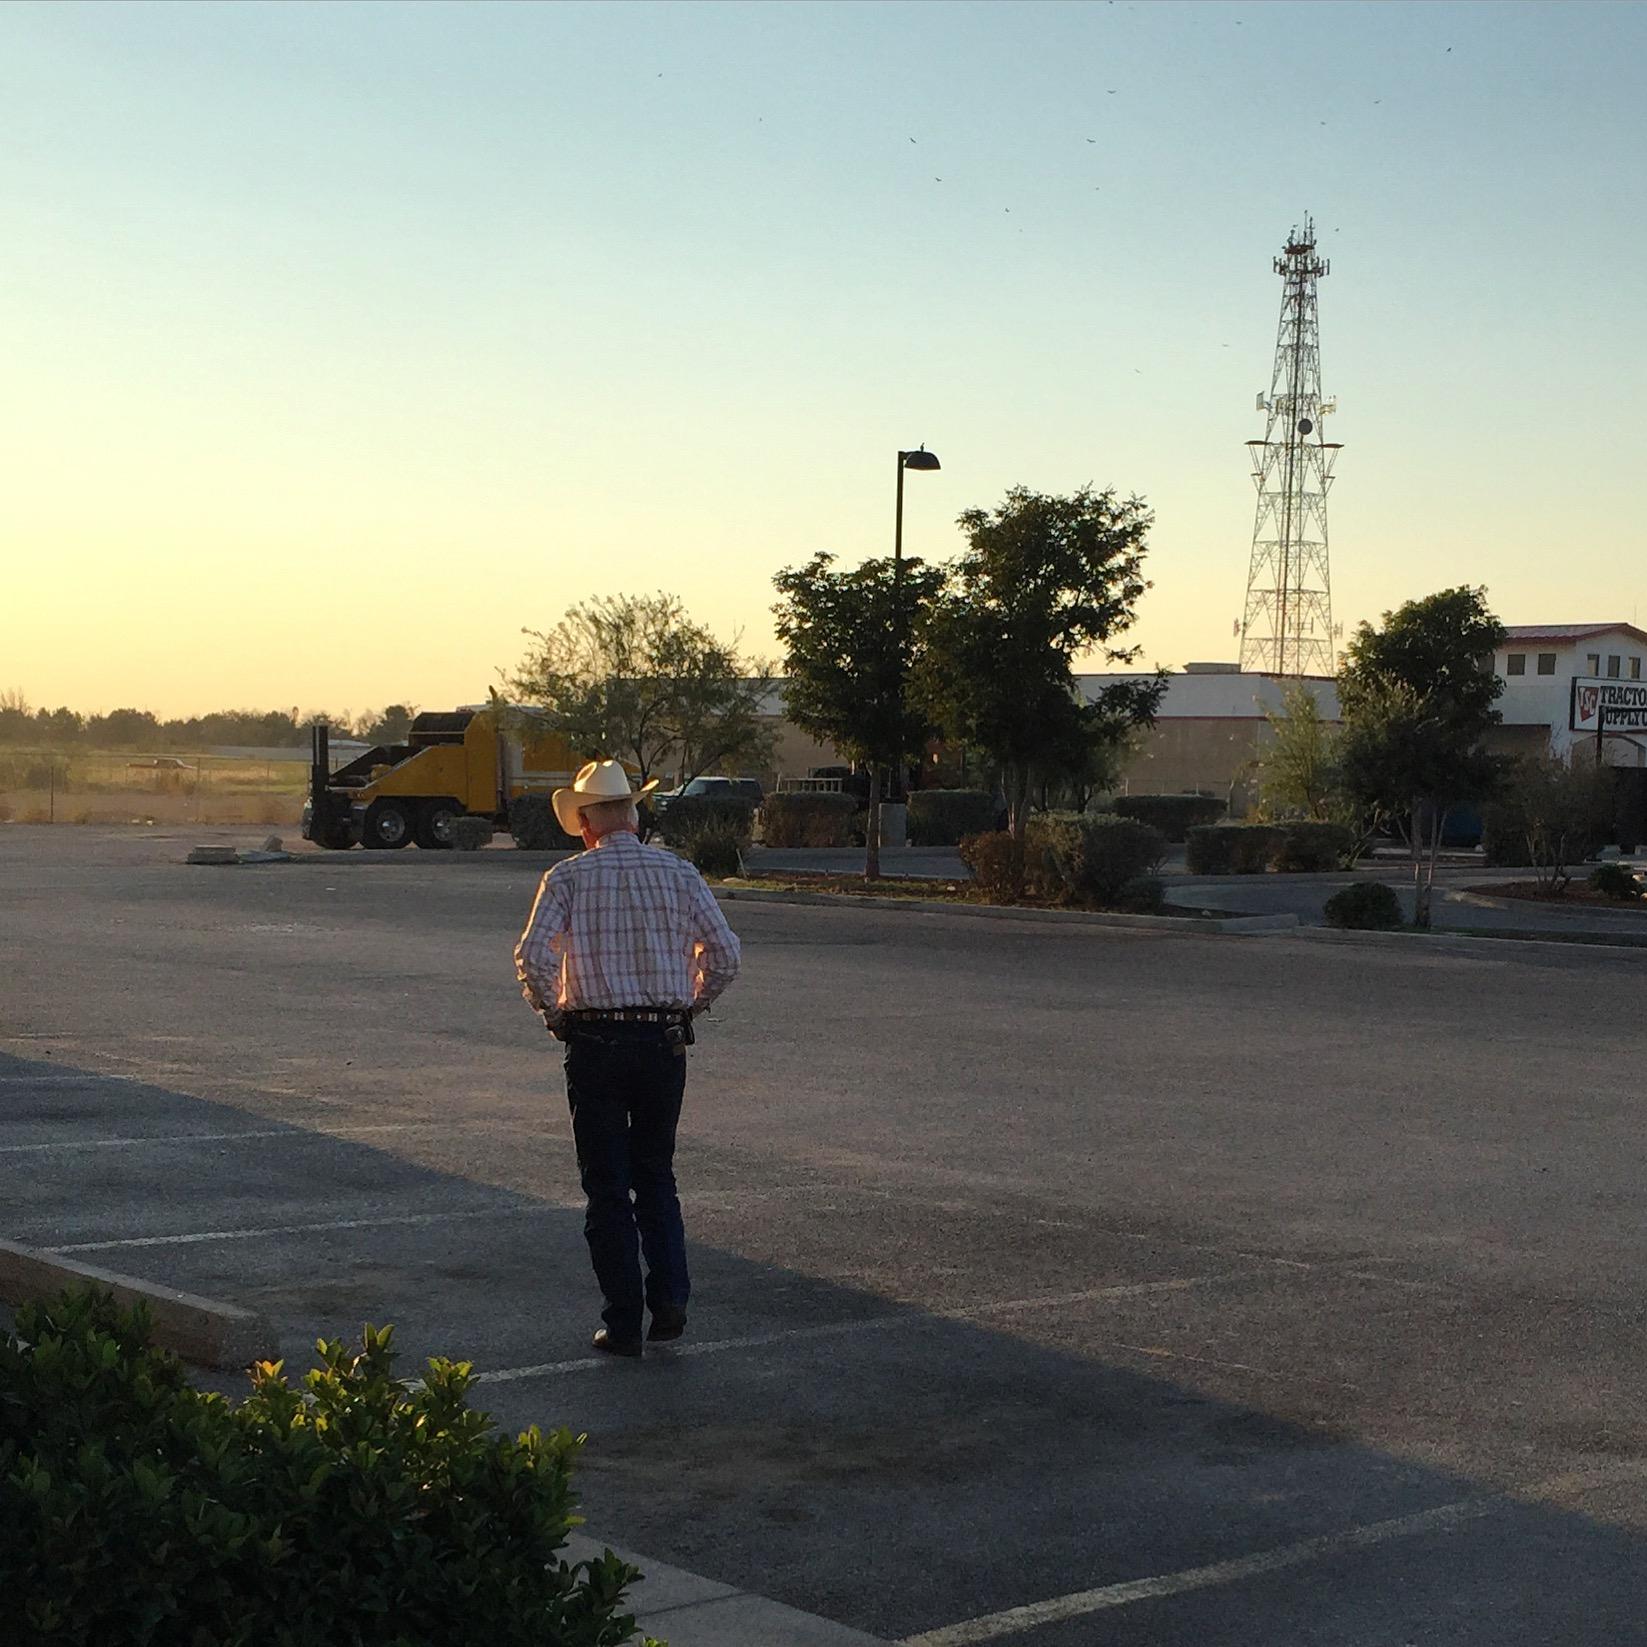 Midland, TX. September, 2015. A lone cowboy walking into the sunset...  #Midland    #texas    #tallcity  #SnapshotLives